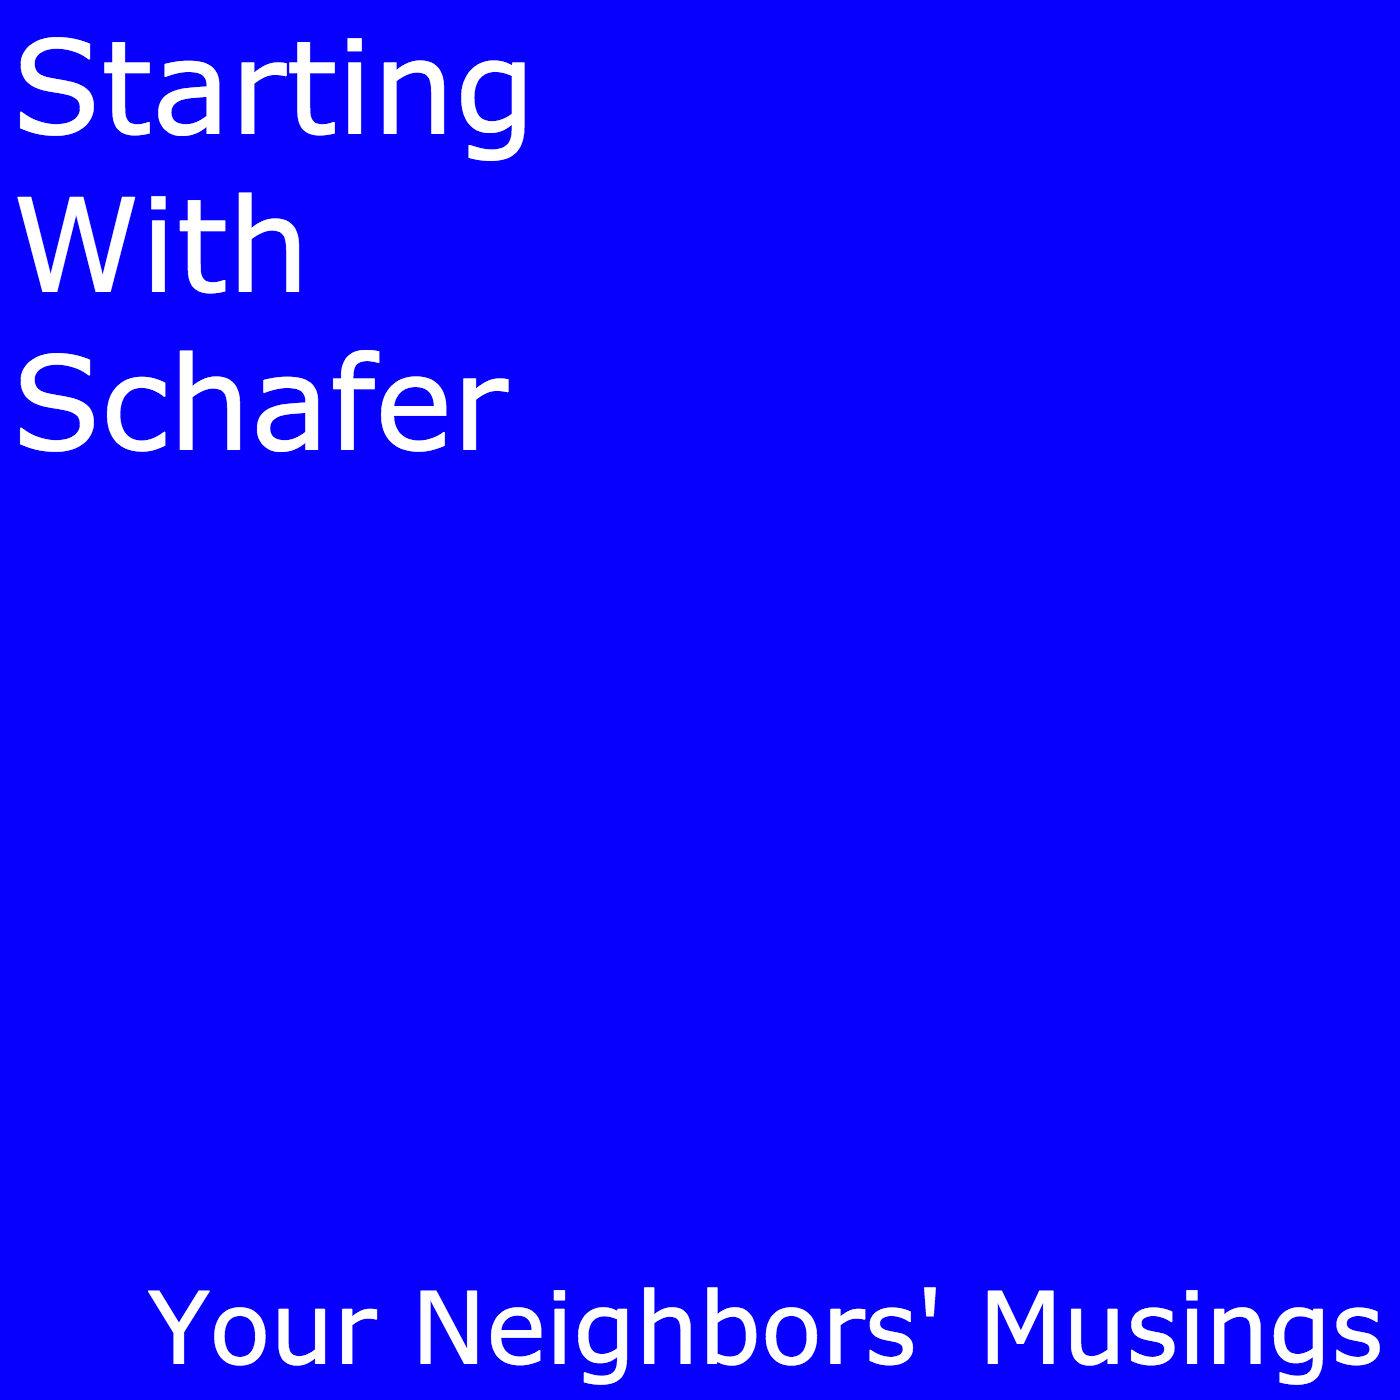 Starting with Schafer